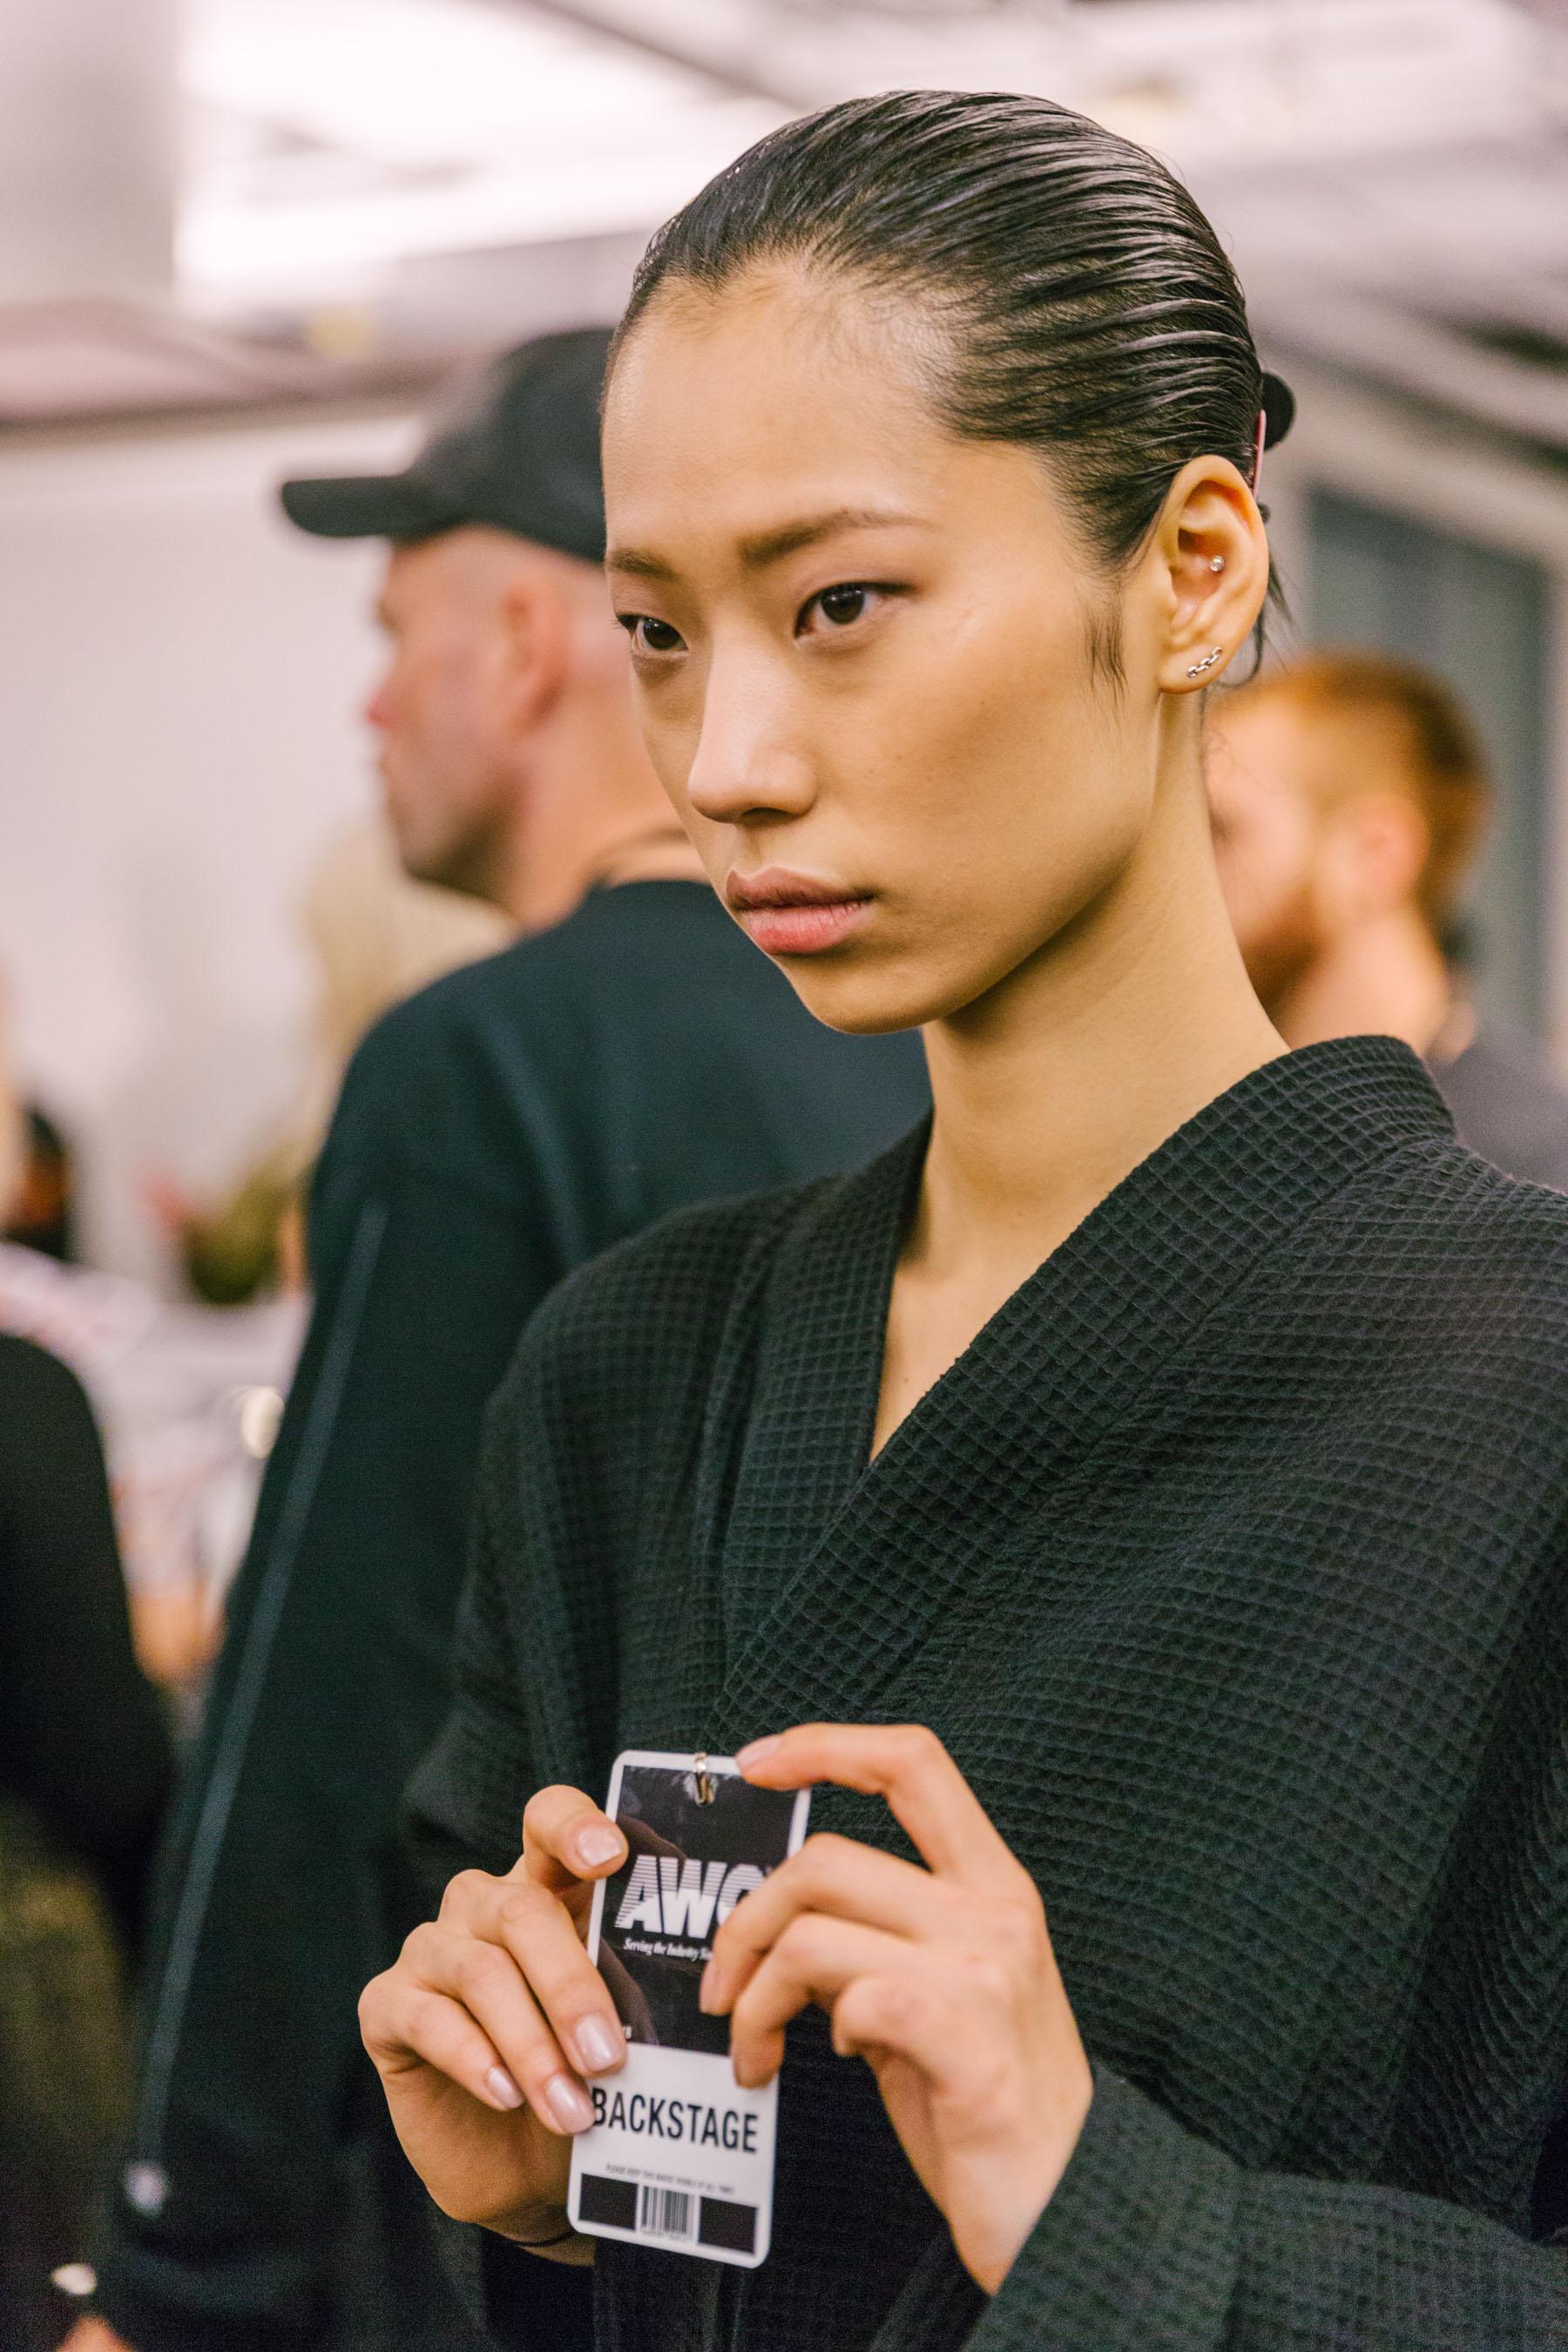 5 MAJOR BEAUTY TRENDS FROM NYFW BACKSTAGE // Notjessfashion.com // fall 2018 beauty trends, fall 2018 nyfw backstage, fall 2018 runway beauty